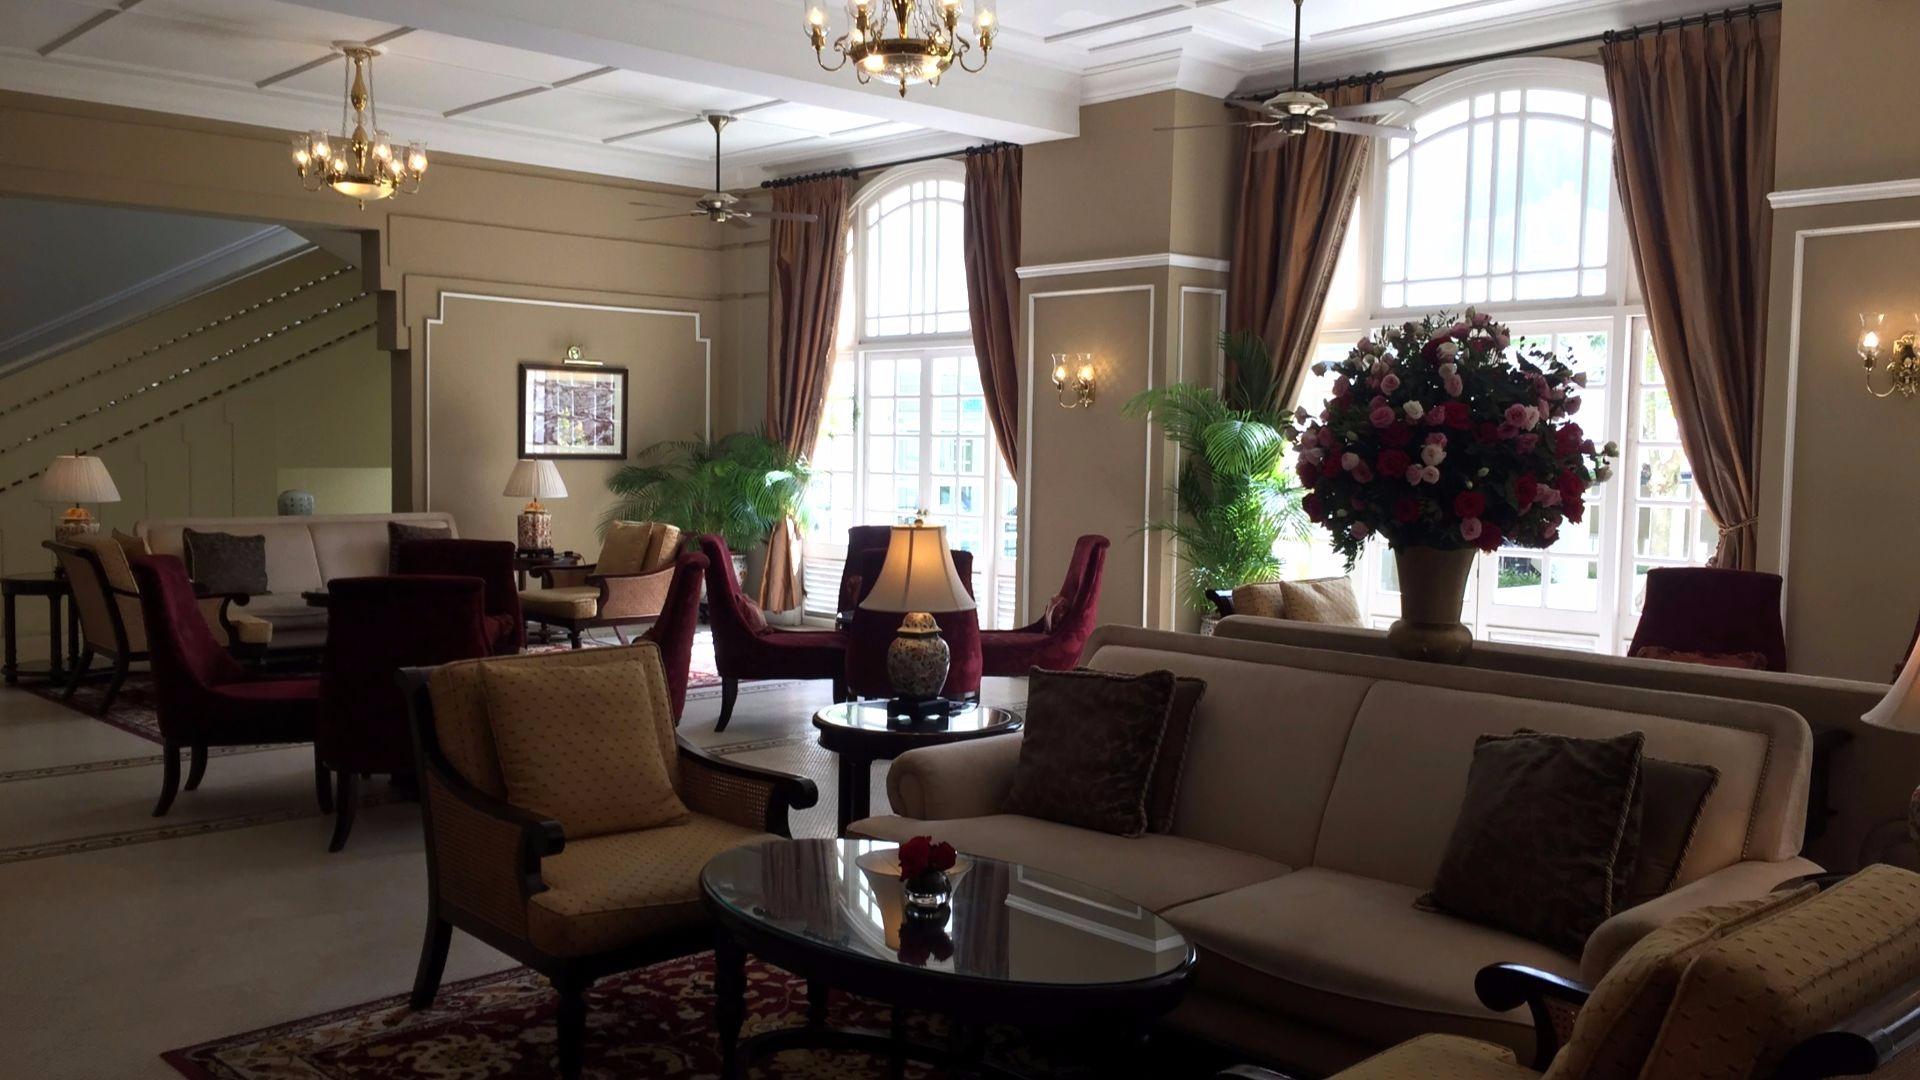 Hotel review: Majestic Hotel in Kuala Lumpur